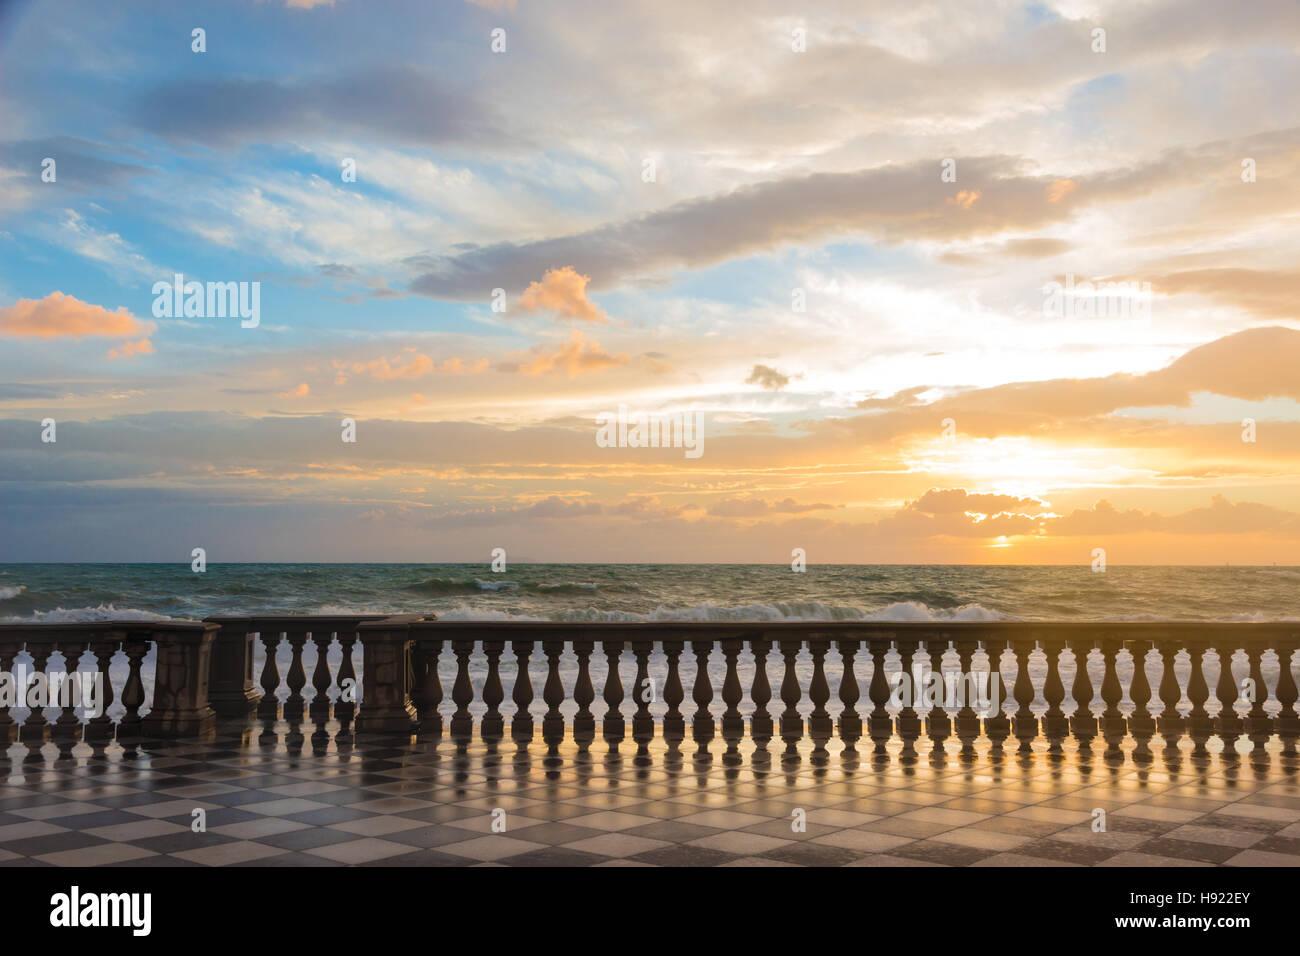 Terrazza Mascagni a Livorno at sunset Stock Photo: 126050371 - Alamy